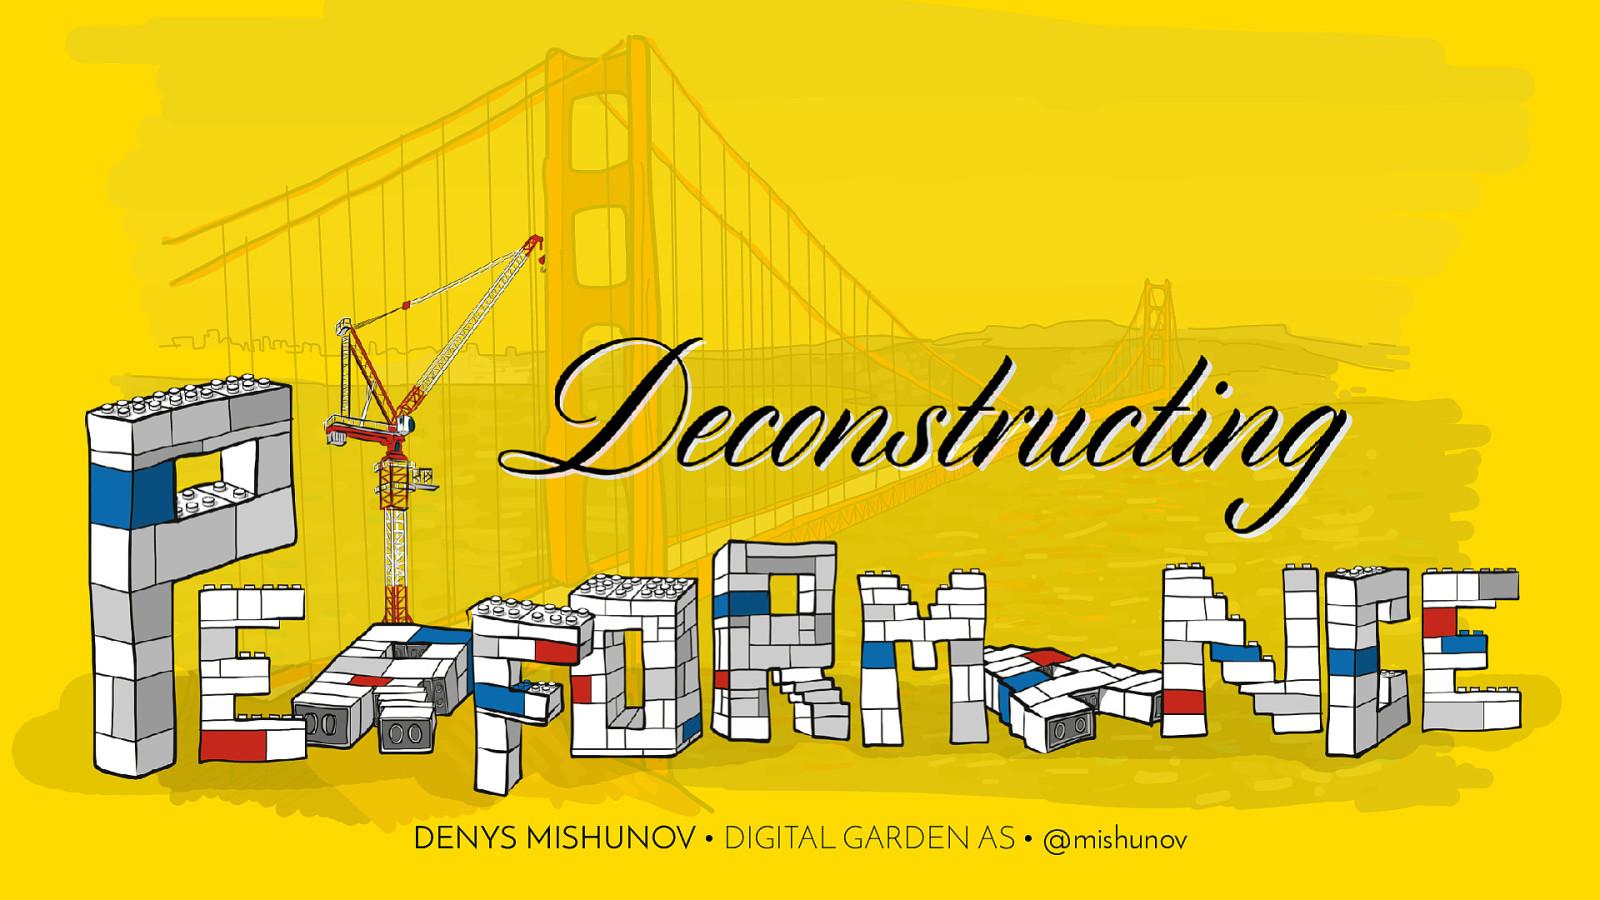 Deconstructing Performance